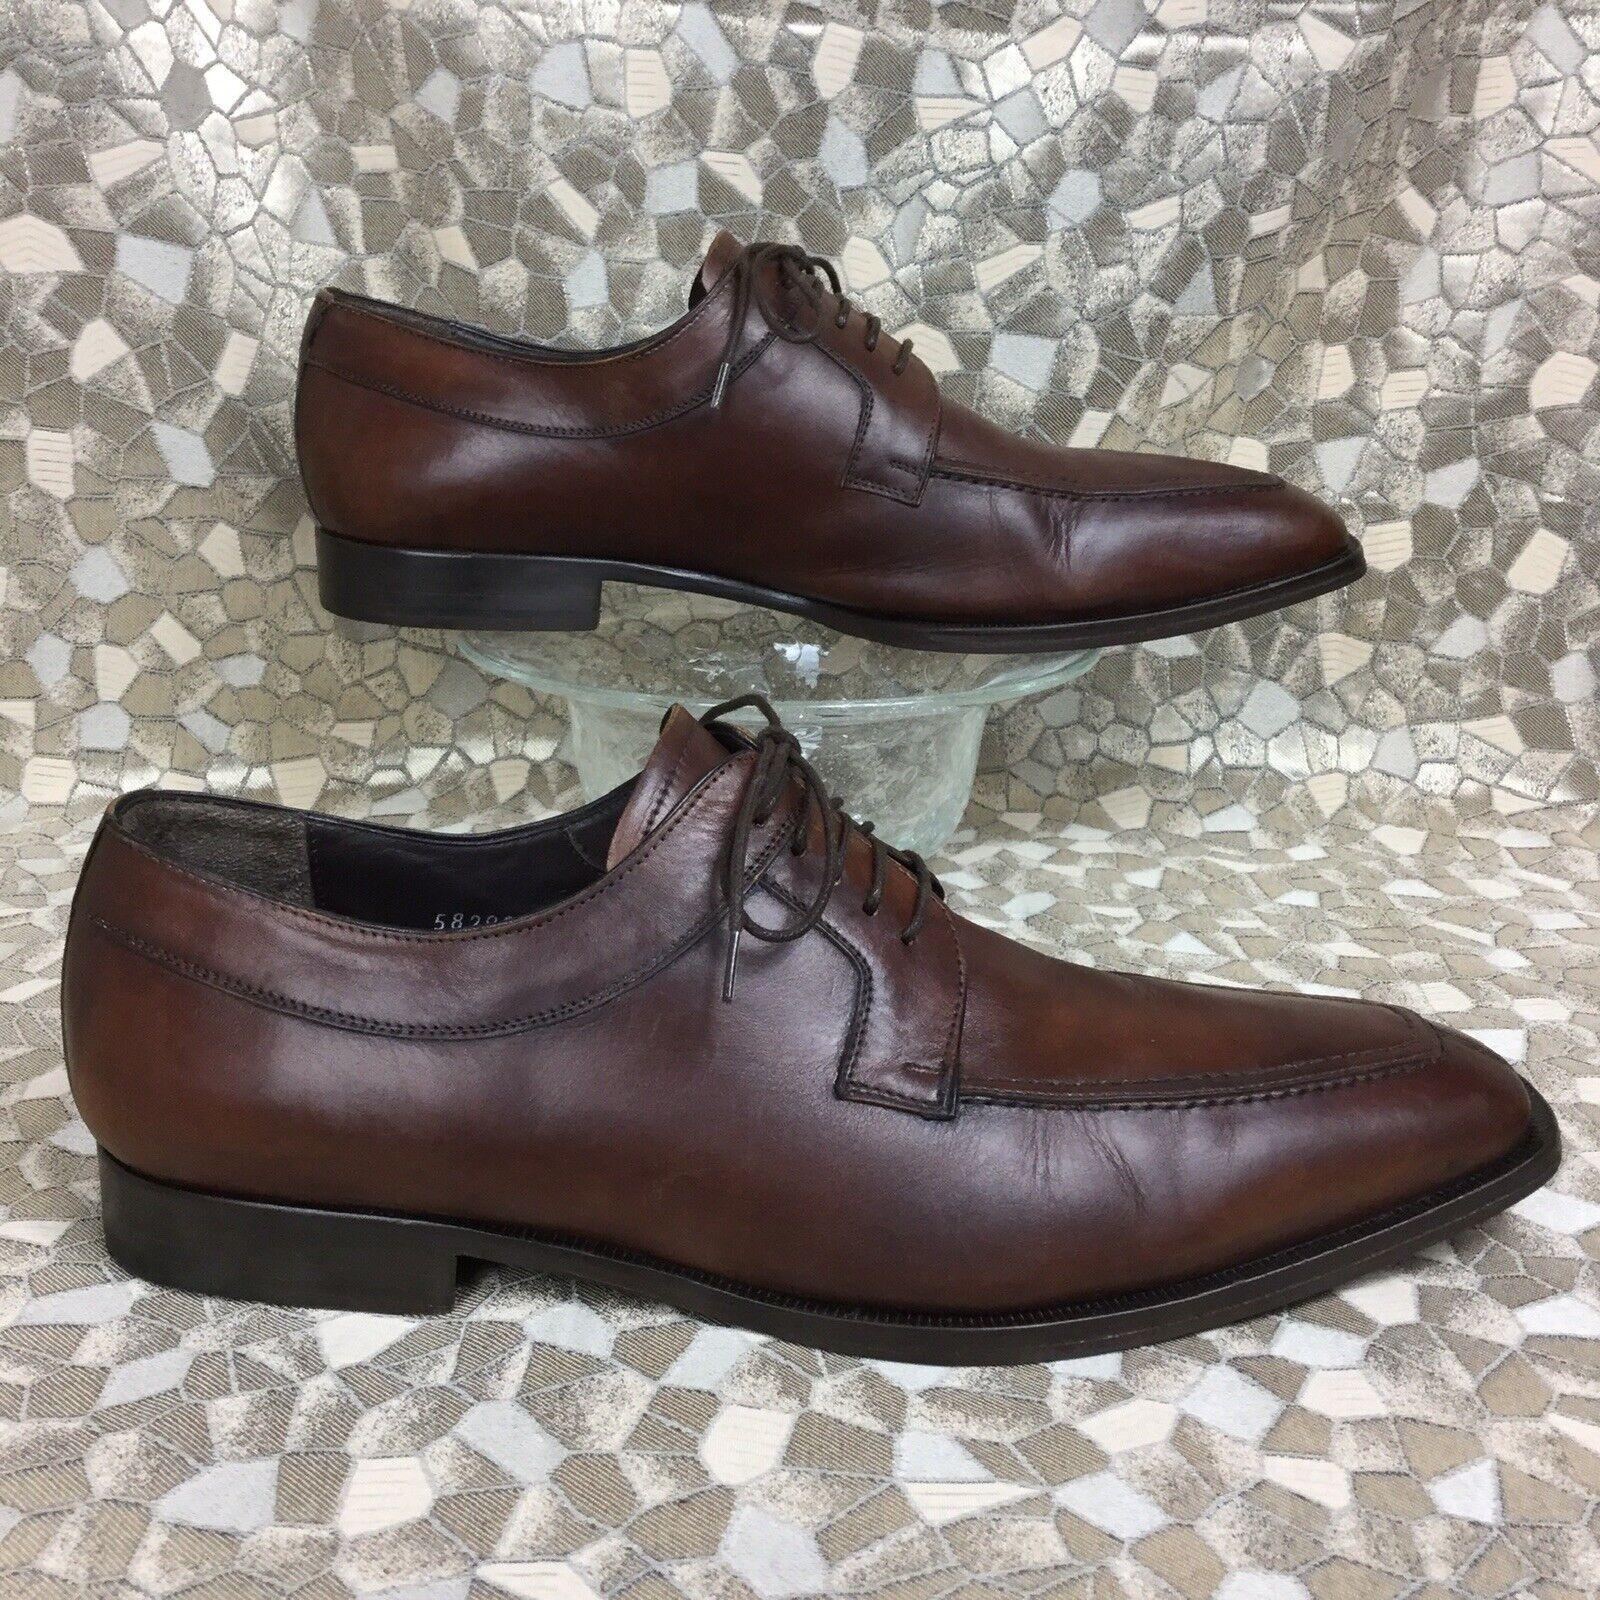 MEZLAN HUNDLEY II Mahogany leather Apron Toe Oxfords dress shoe 12801 12 M